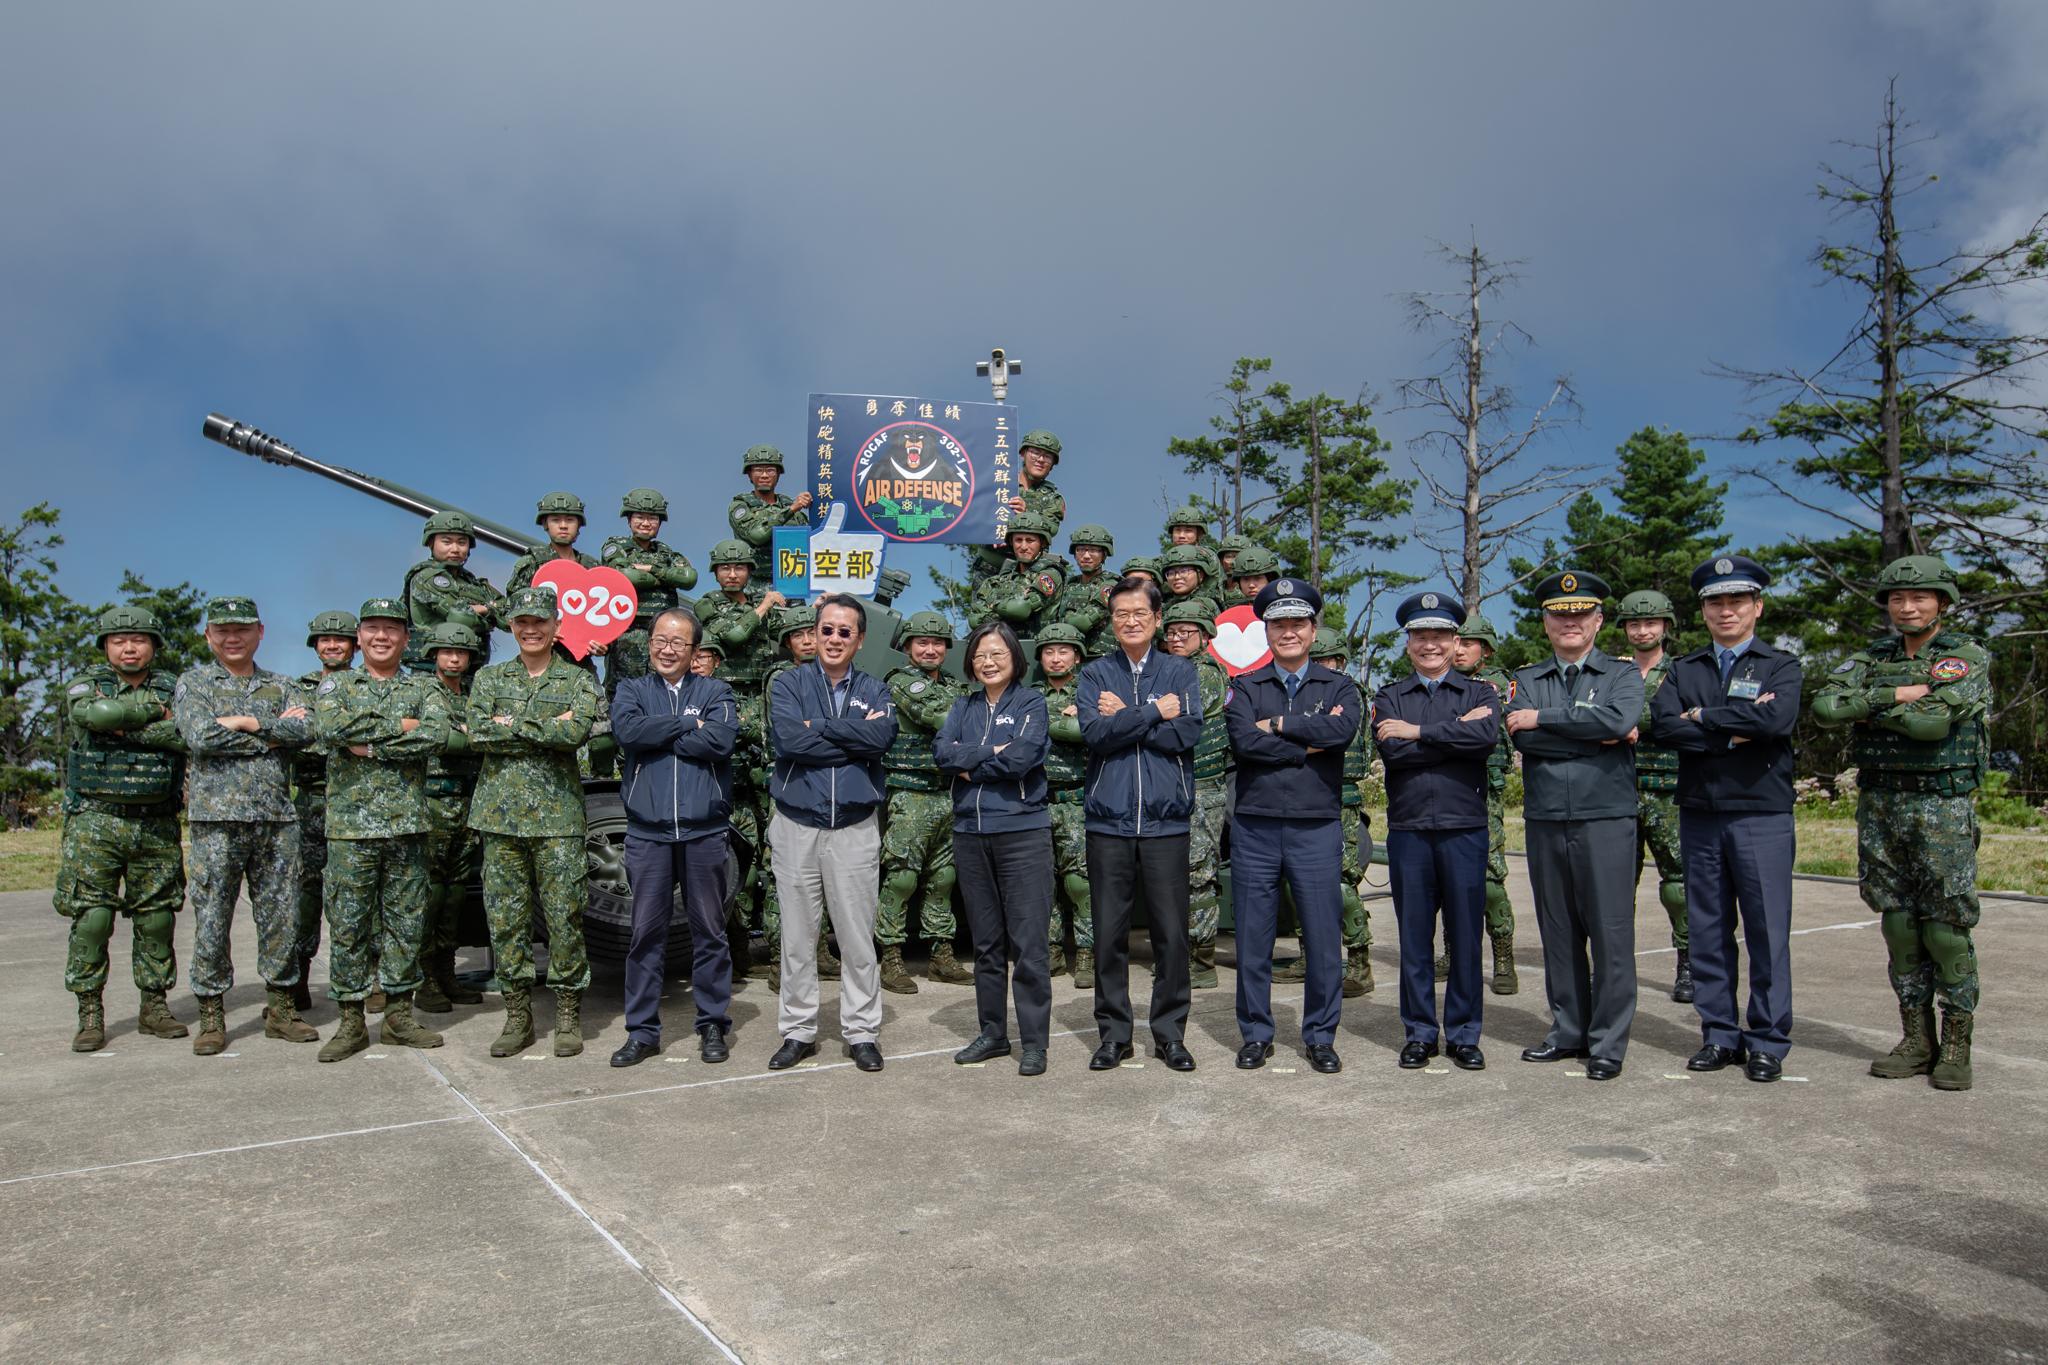 President Tsai Visits Leshan Radar Station and Recognizes Troops' Effort at Safeguarding Homeland